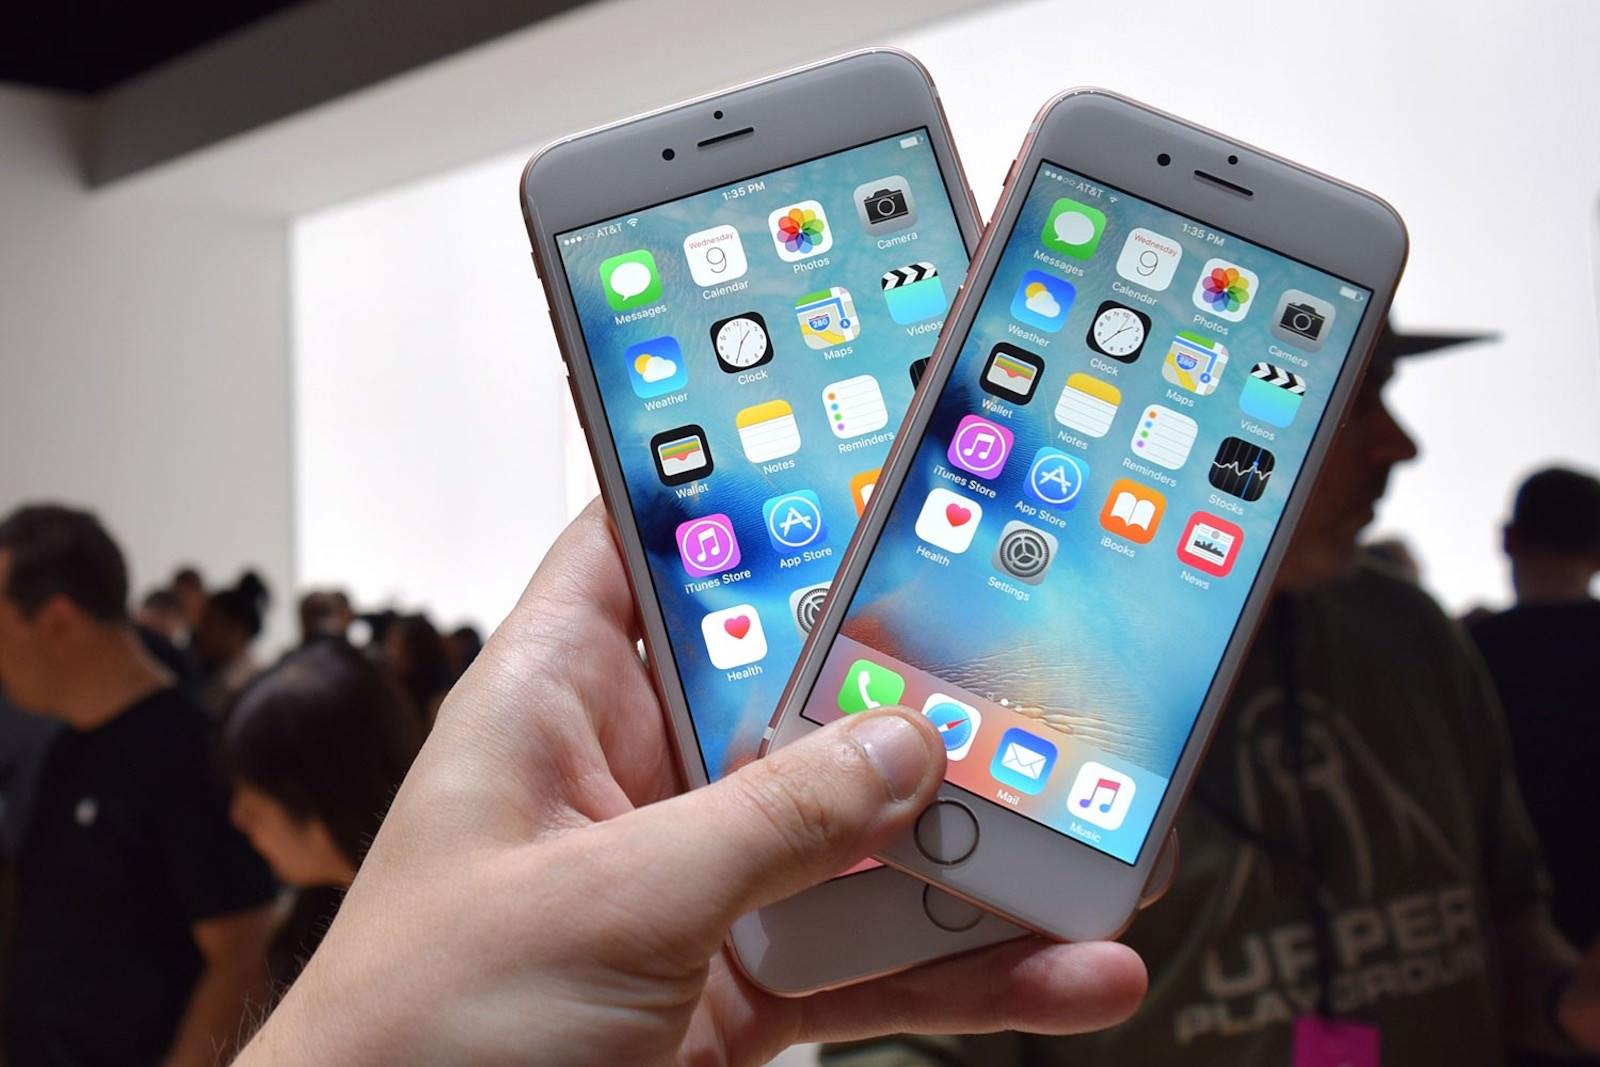 iPhone 6s Plus Russia Akket.com Apple pink gold vs. 2